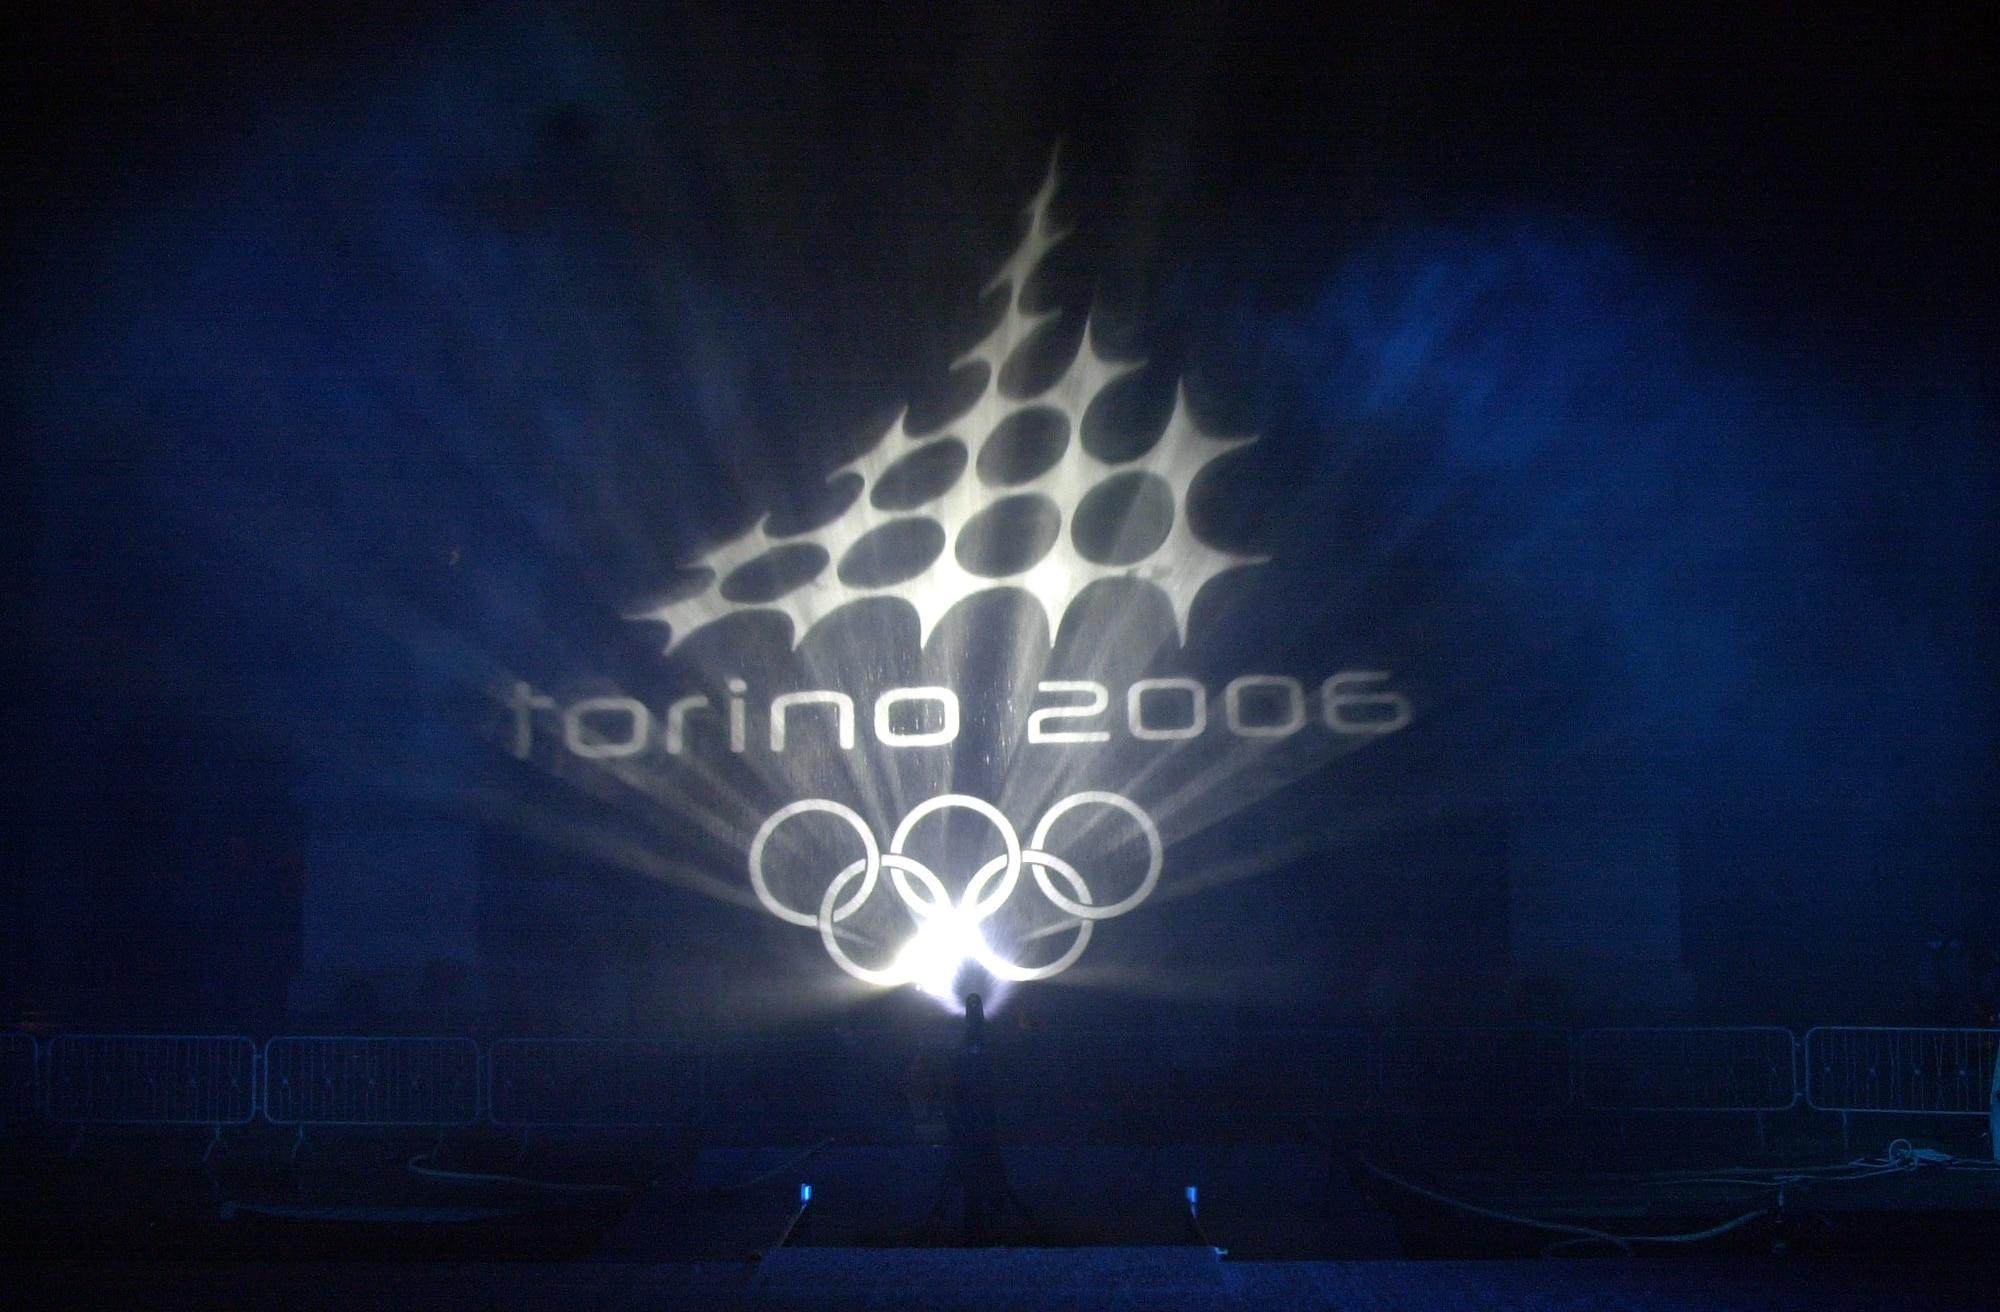 Olimpiadi, Torino 2006